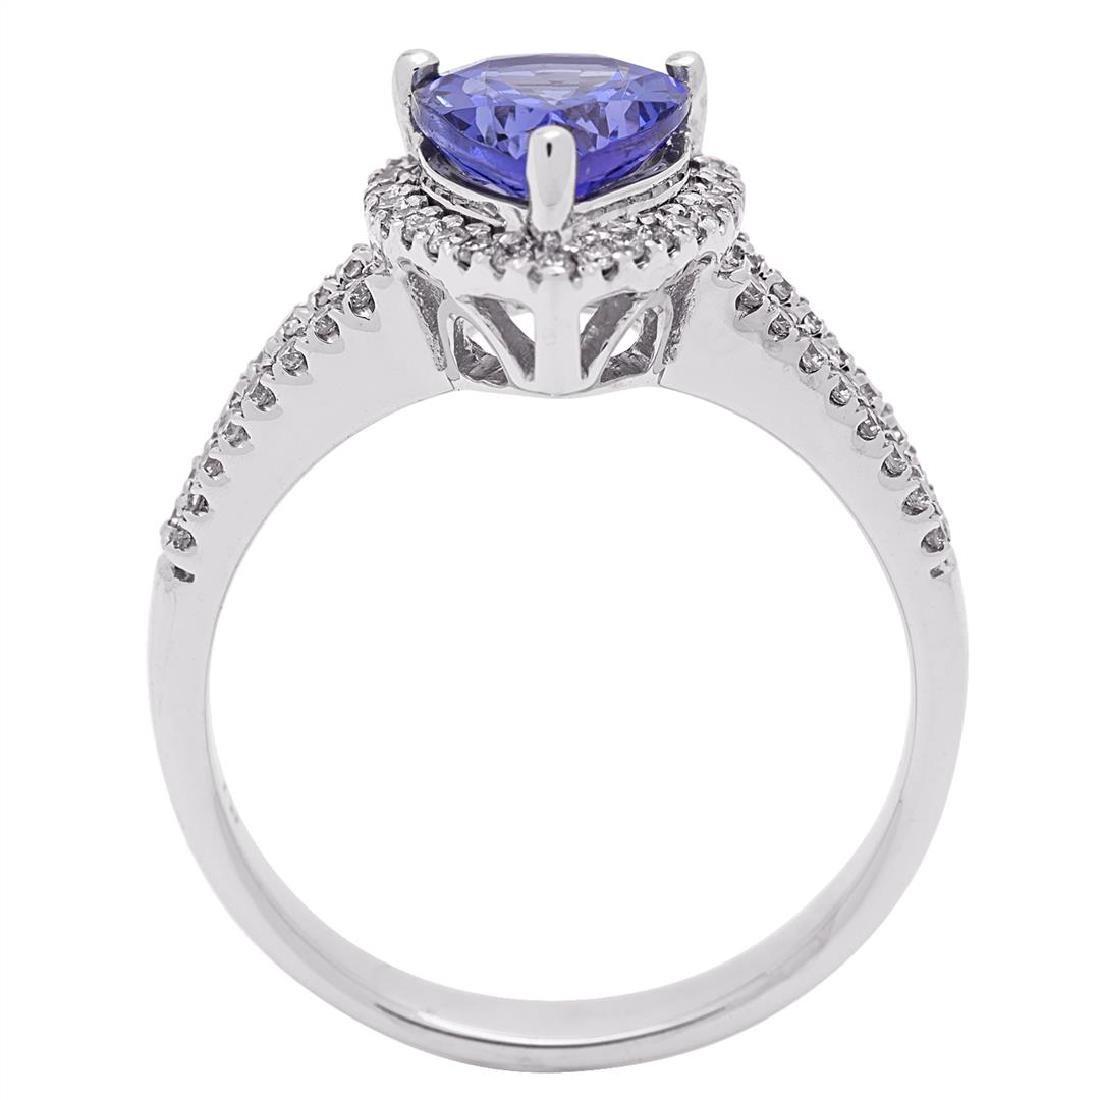 1.93 ctw Tanzanite and Diamond Ring - 14KT White Gold - 4